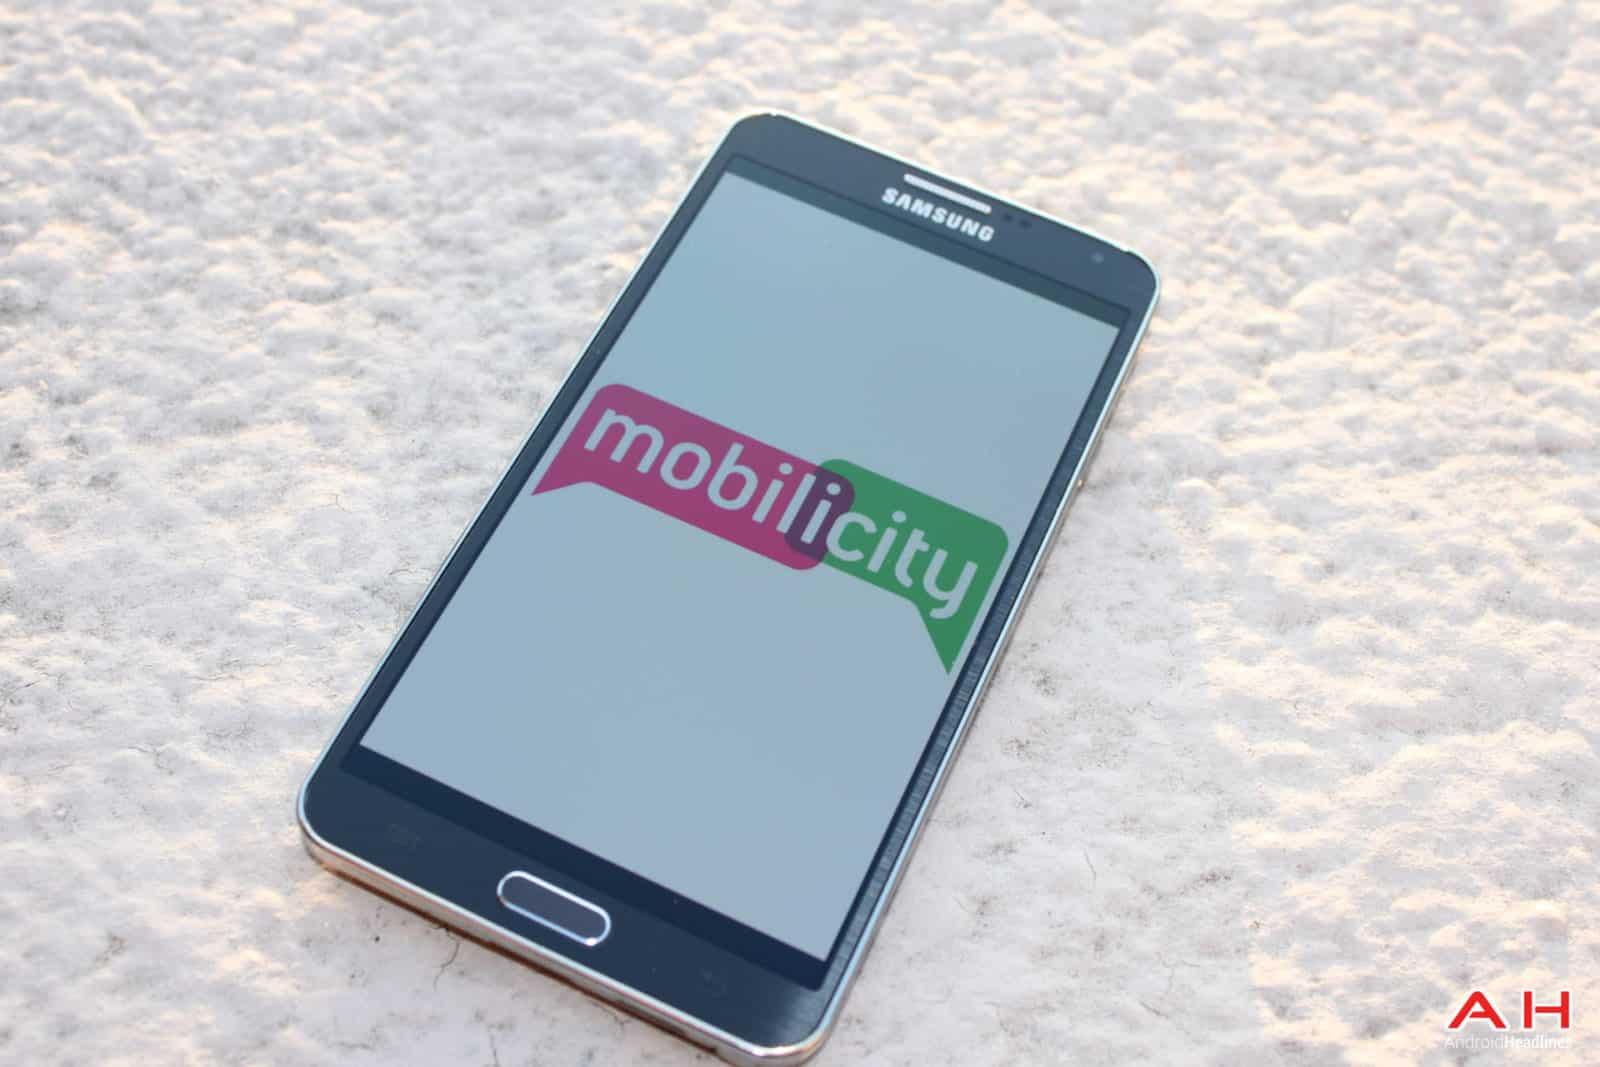 AH Mobilicity Canada Logo 1.1